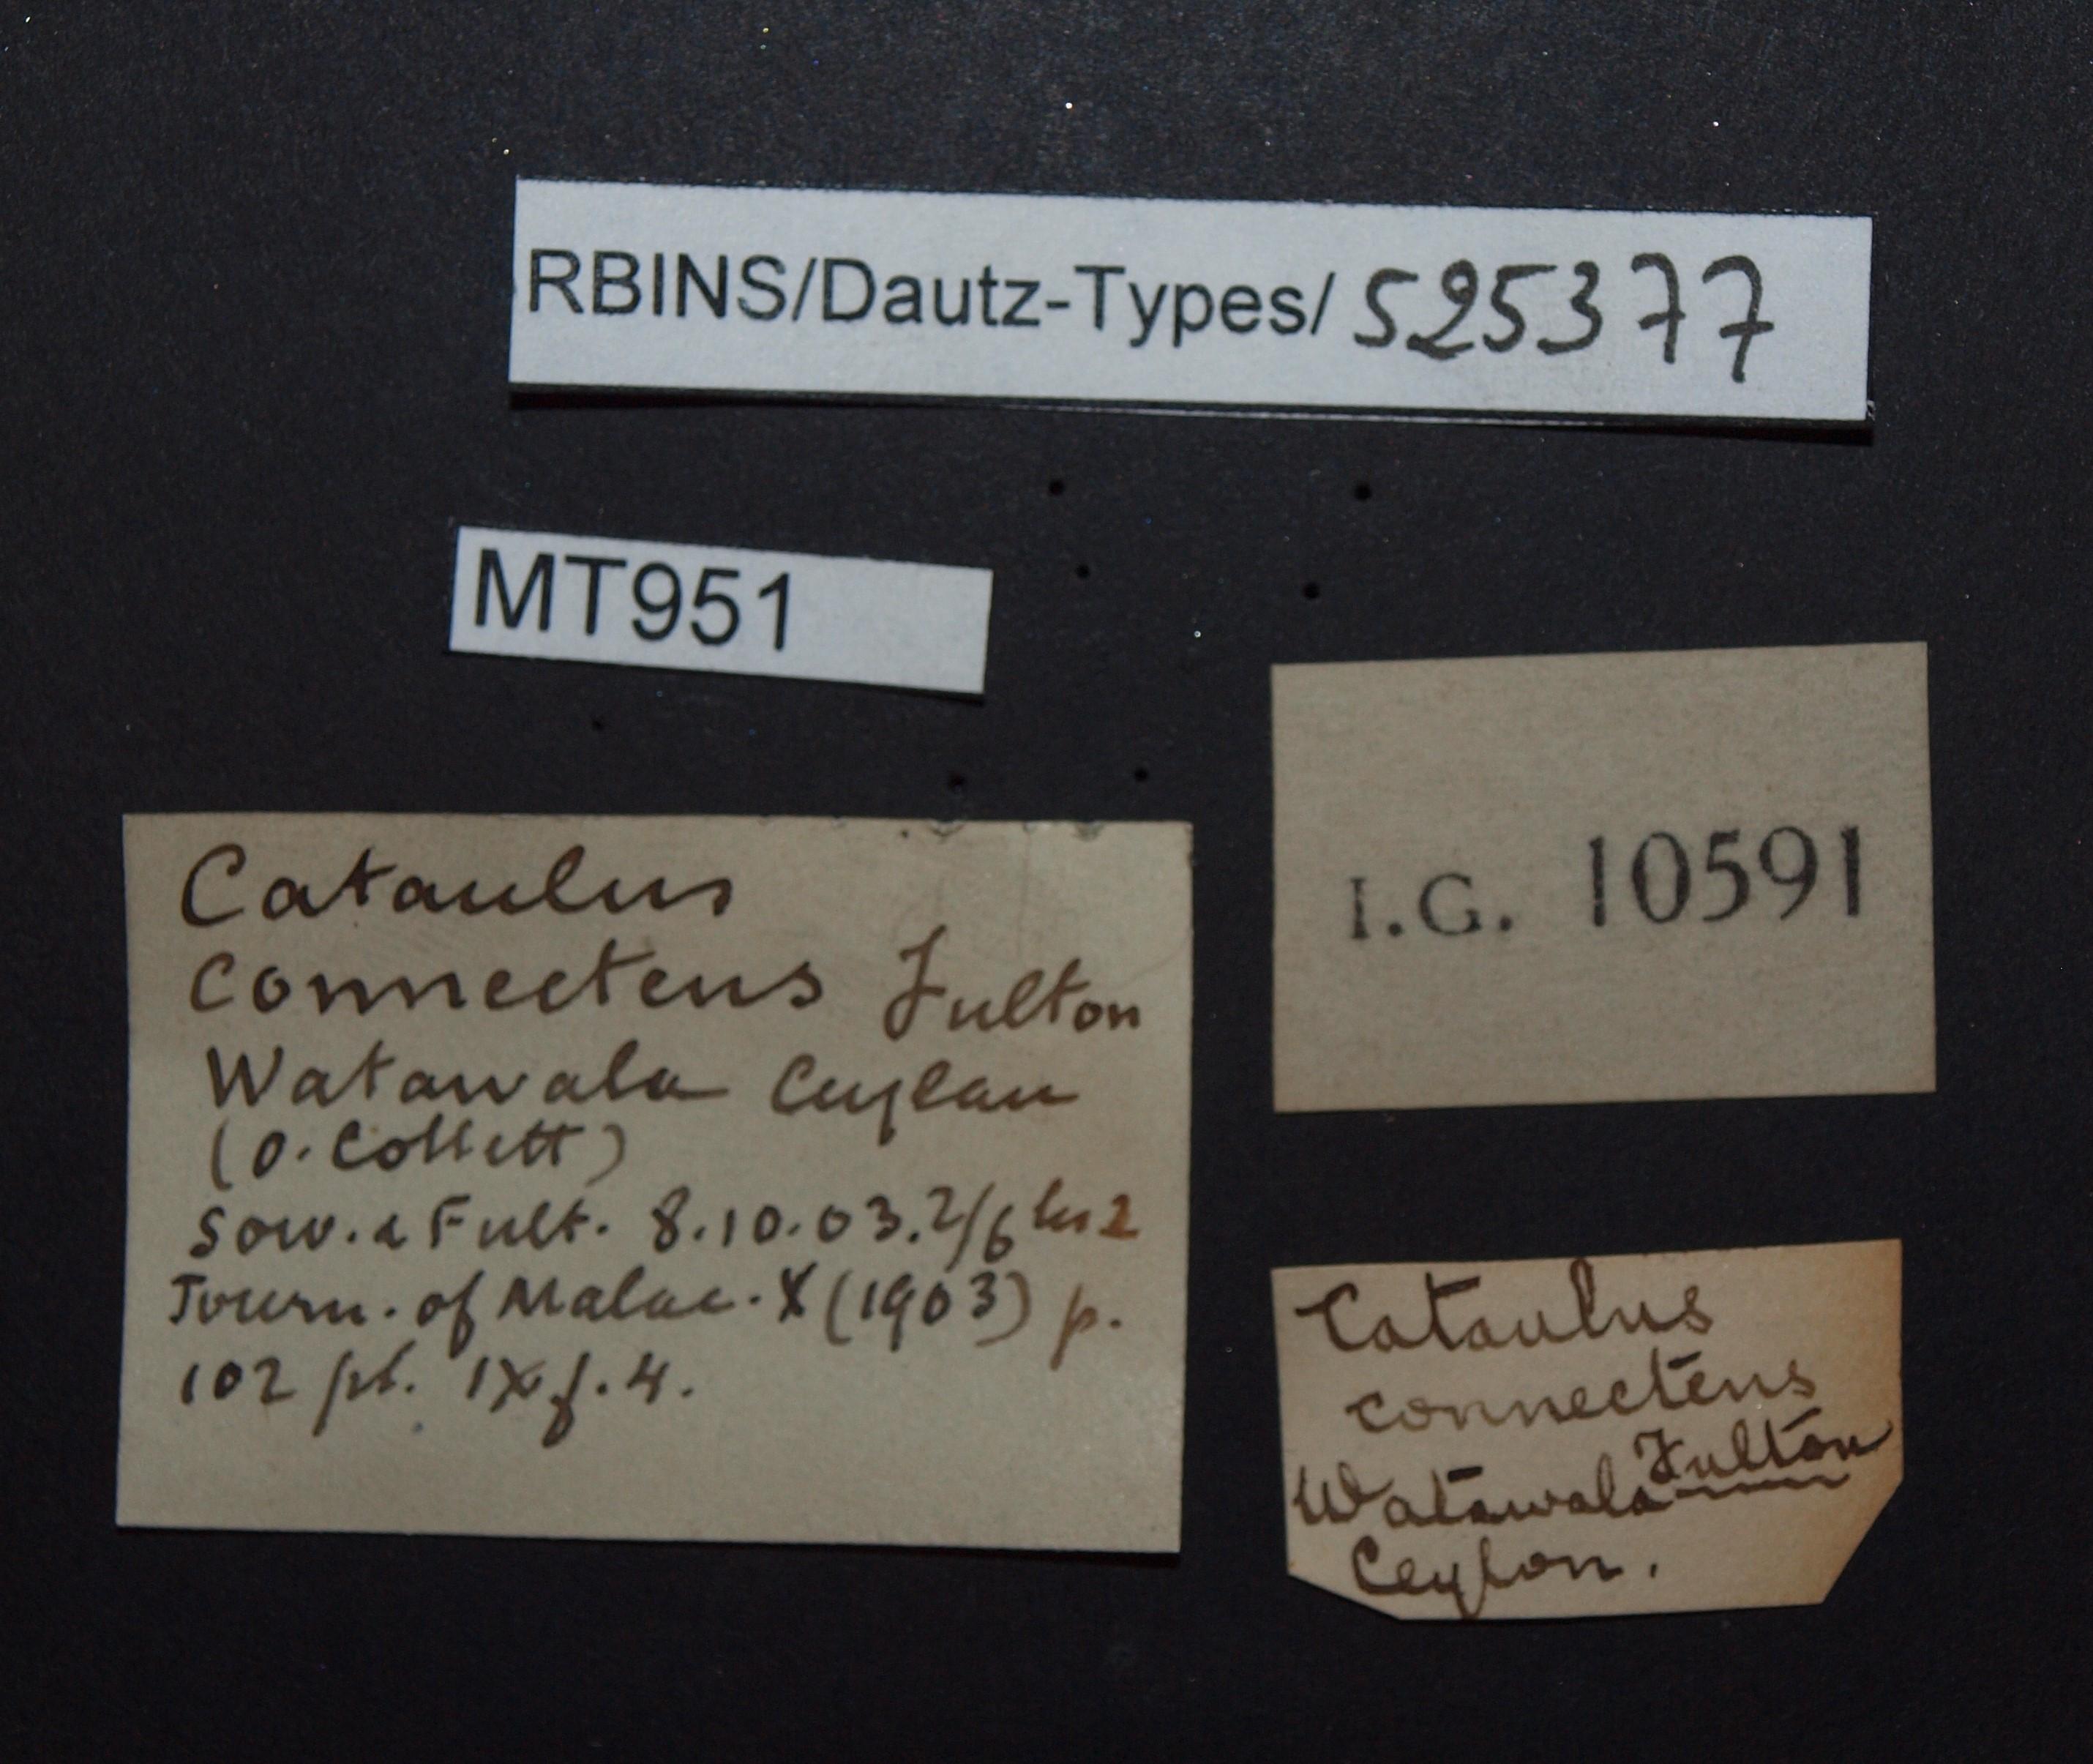 BE-RBINS-INV MT 951 Cataulus connectens pt Lb.jpg